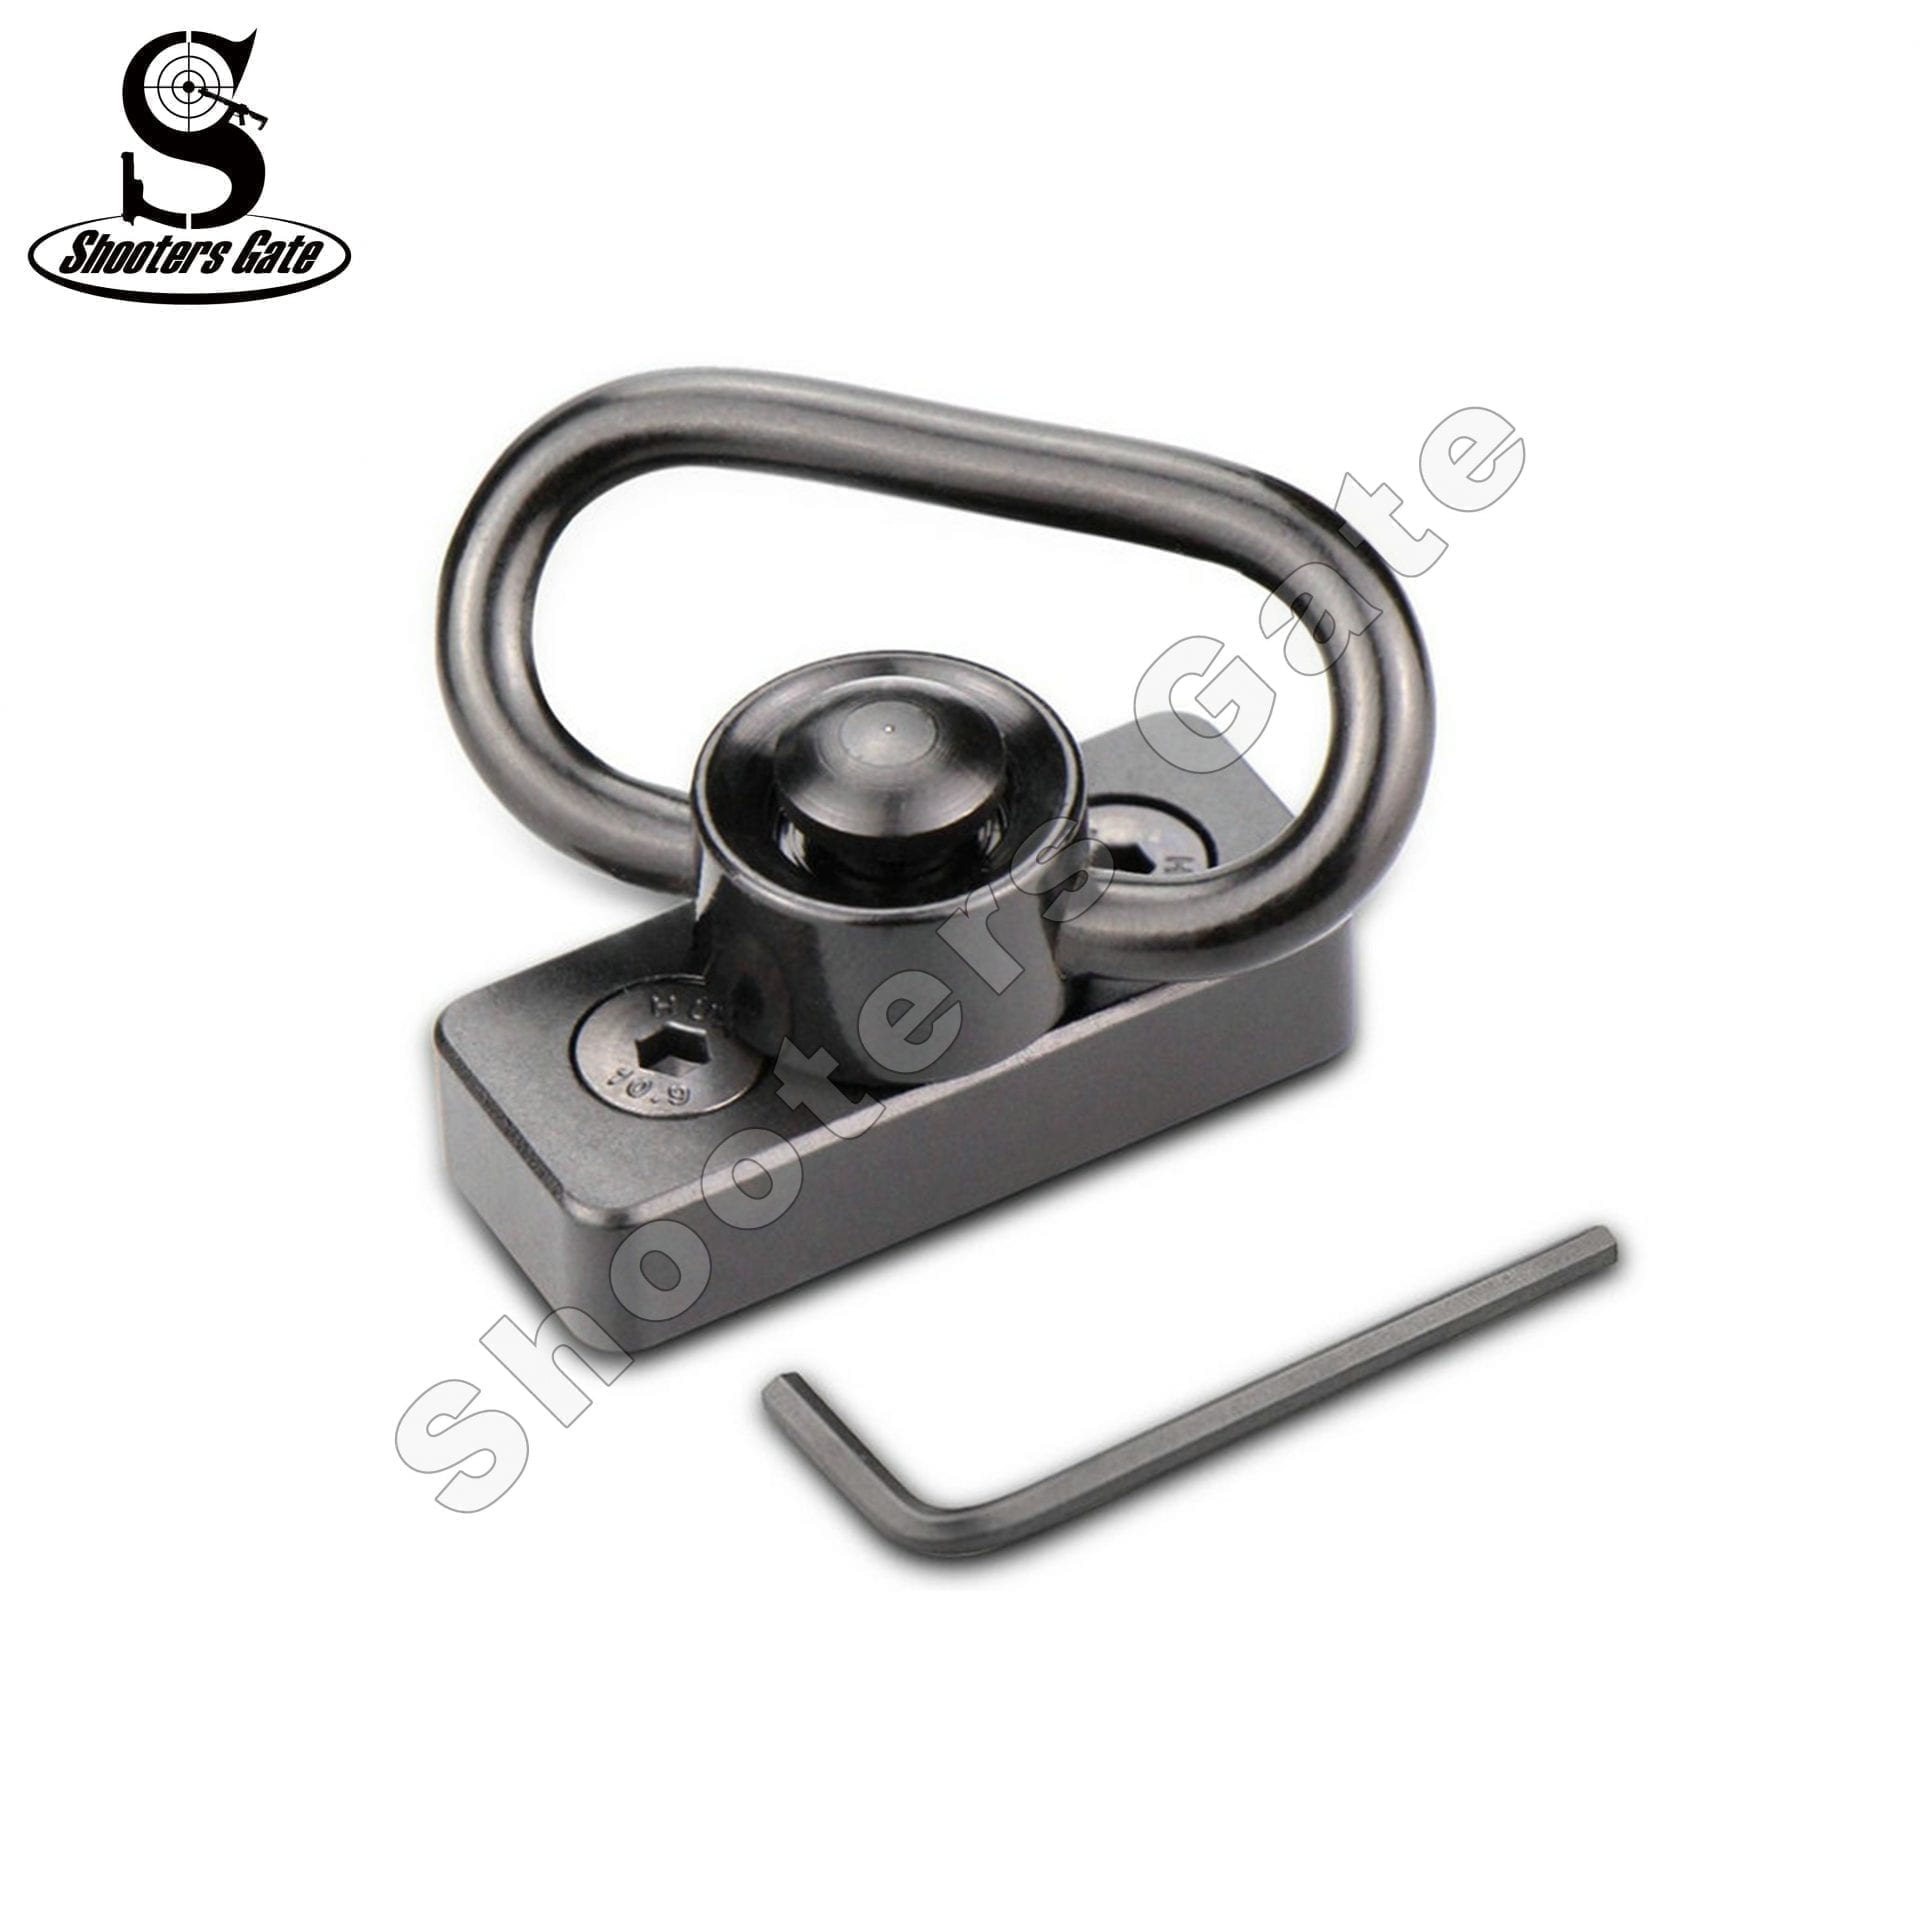 QD Sling Adapter M-Lok